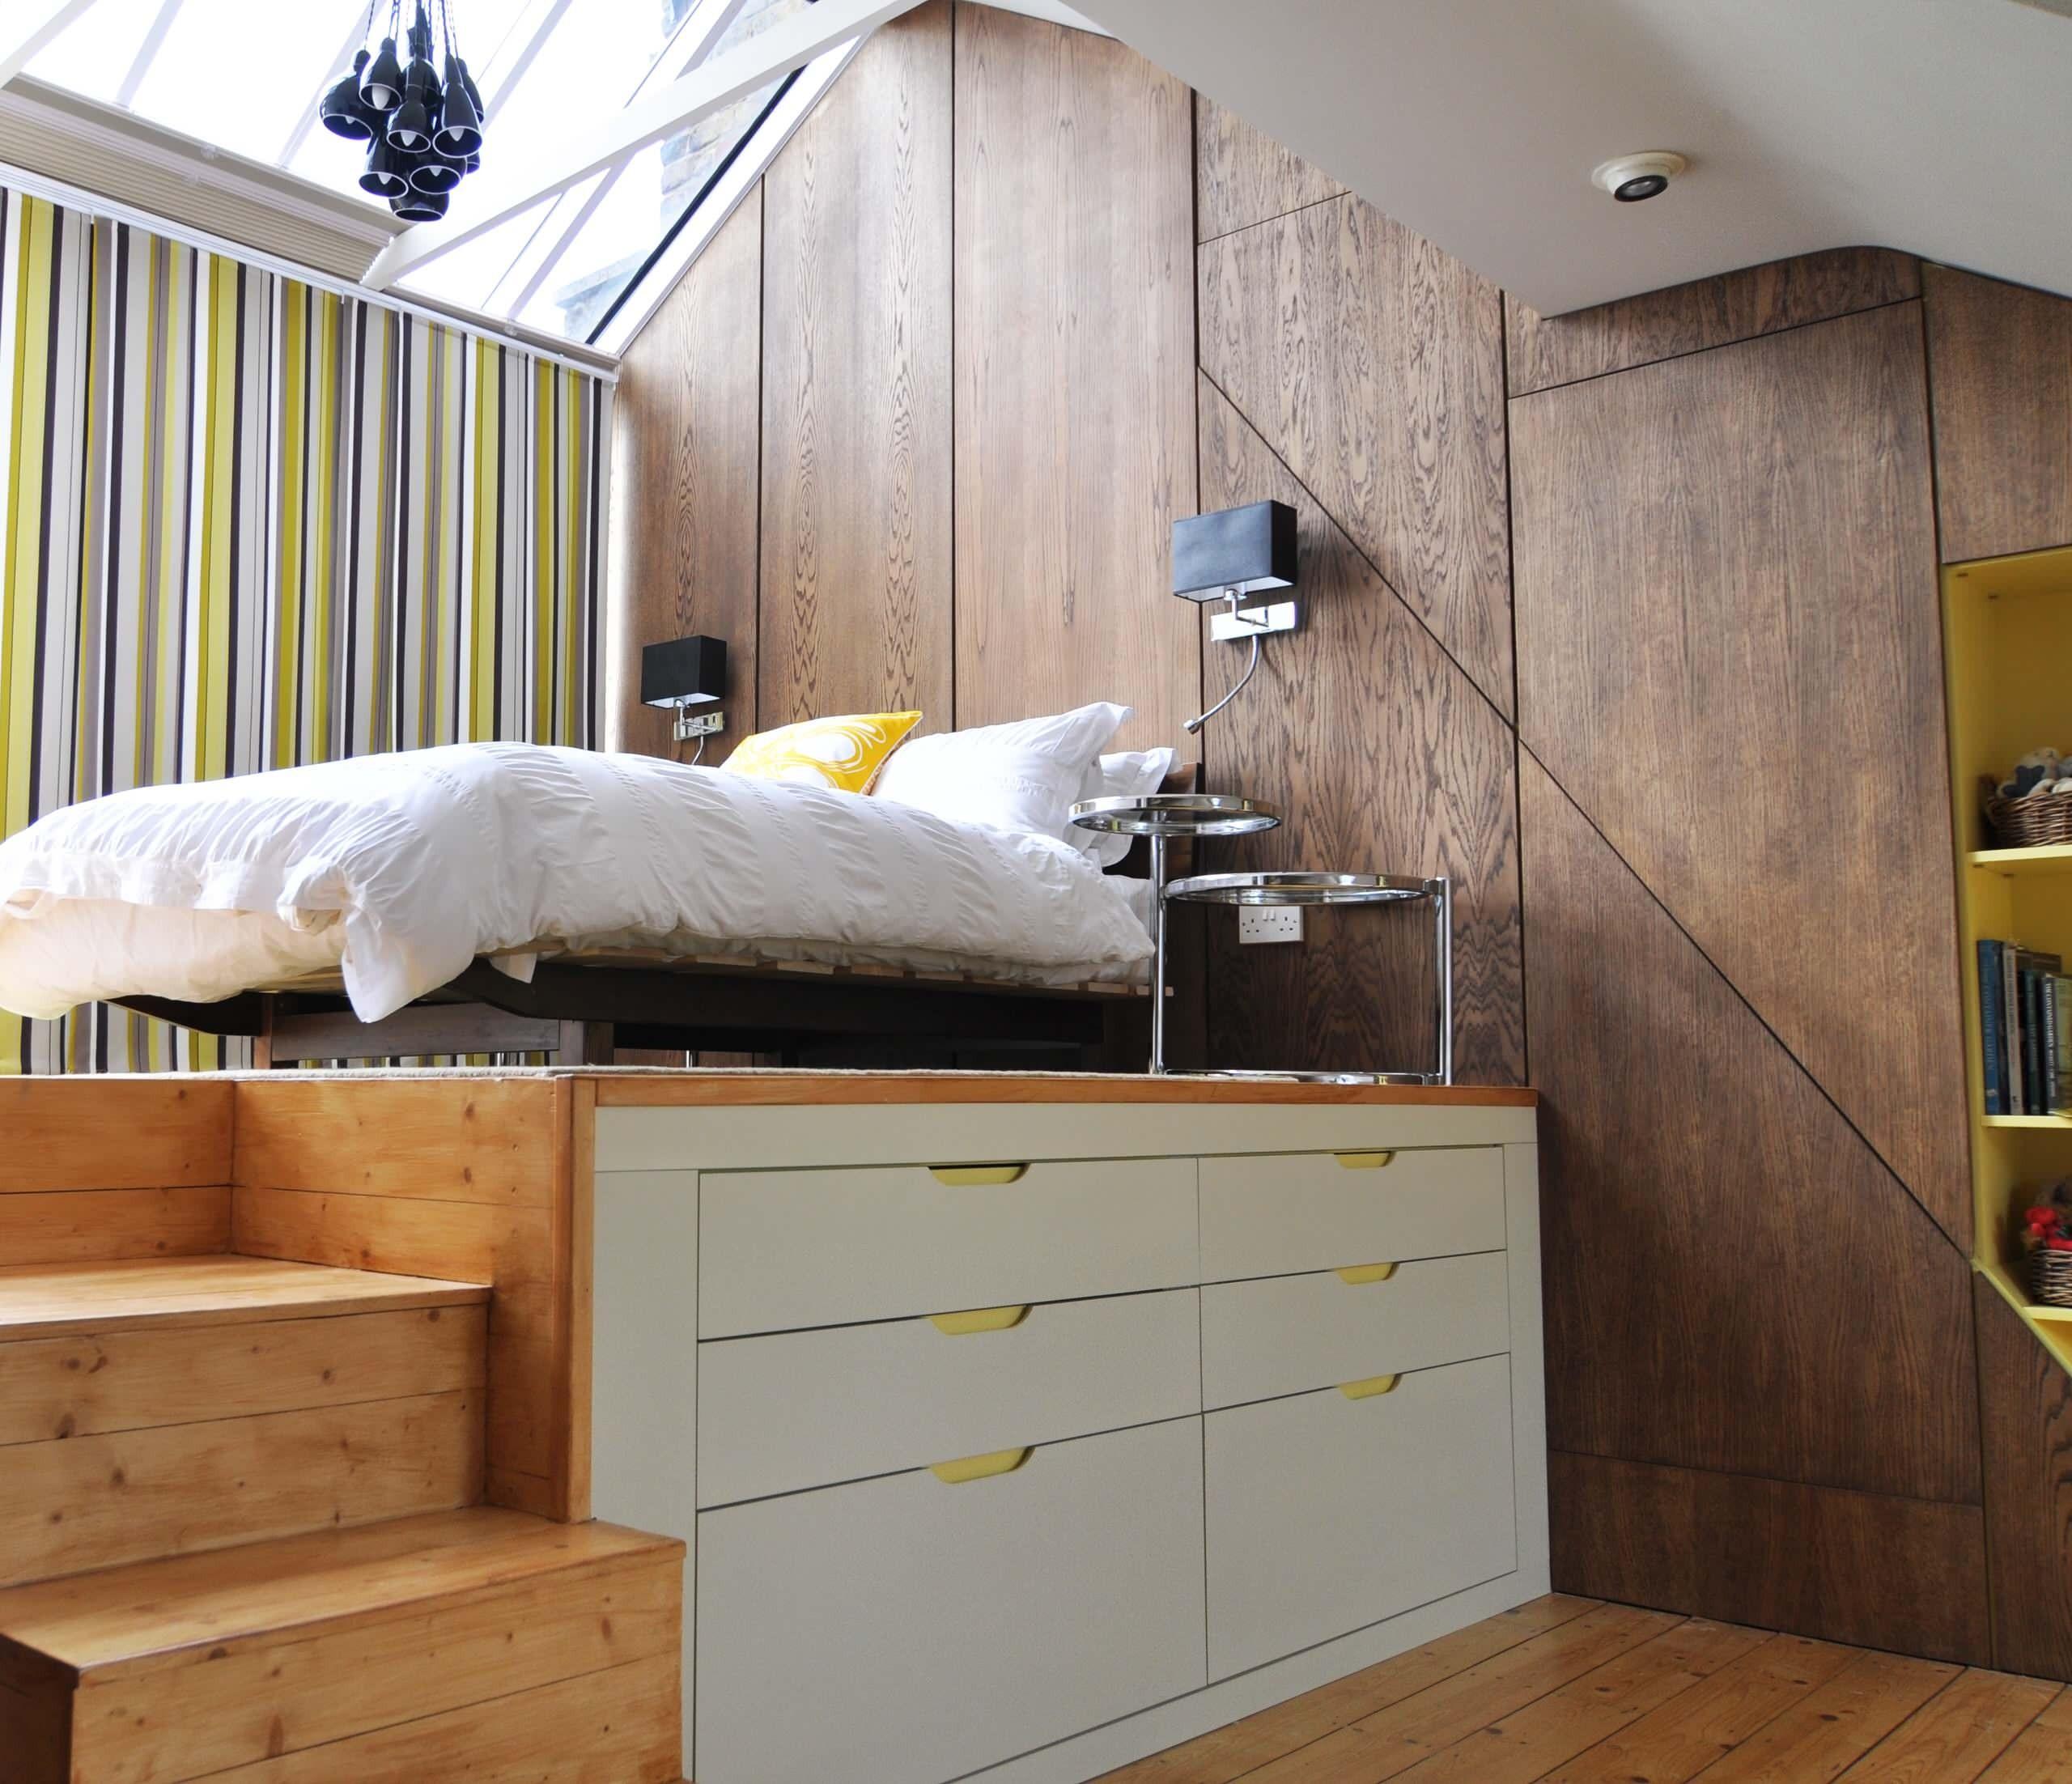 loft beds with storage underneath